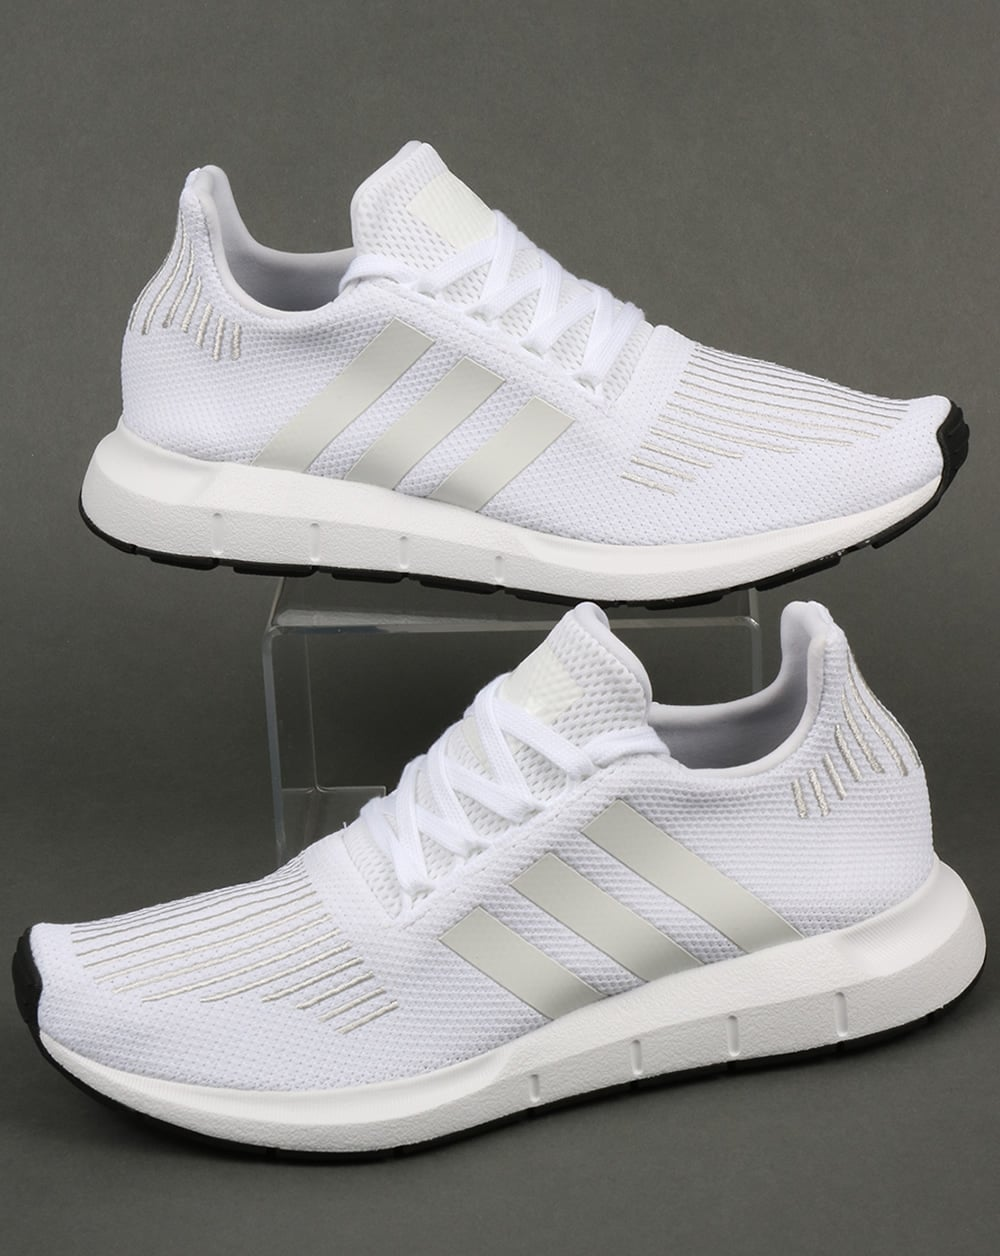 adidas swift runners off 57% - www